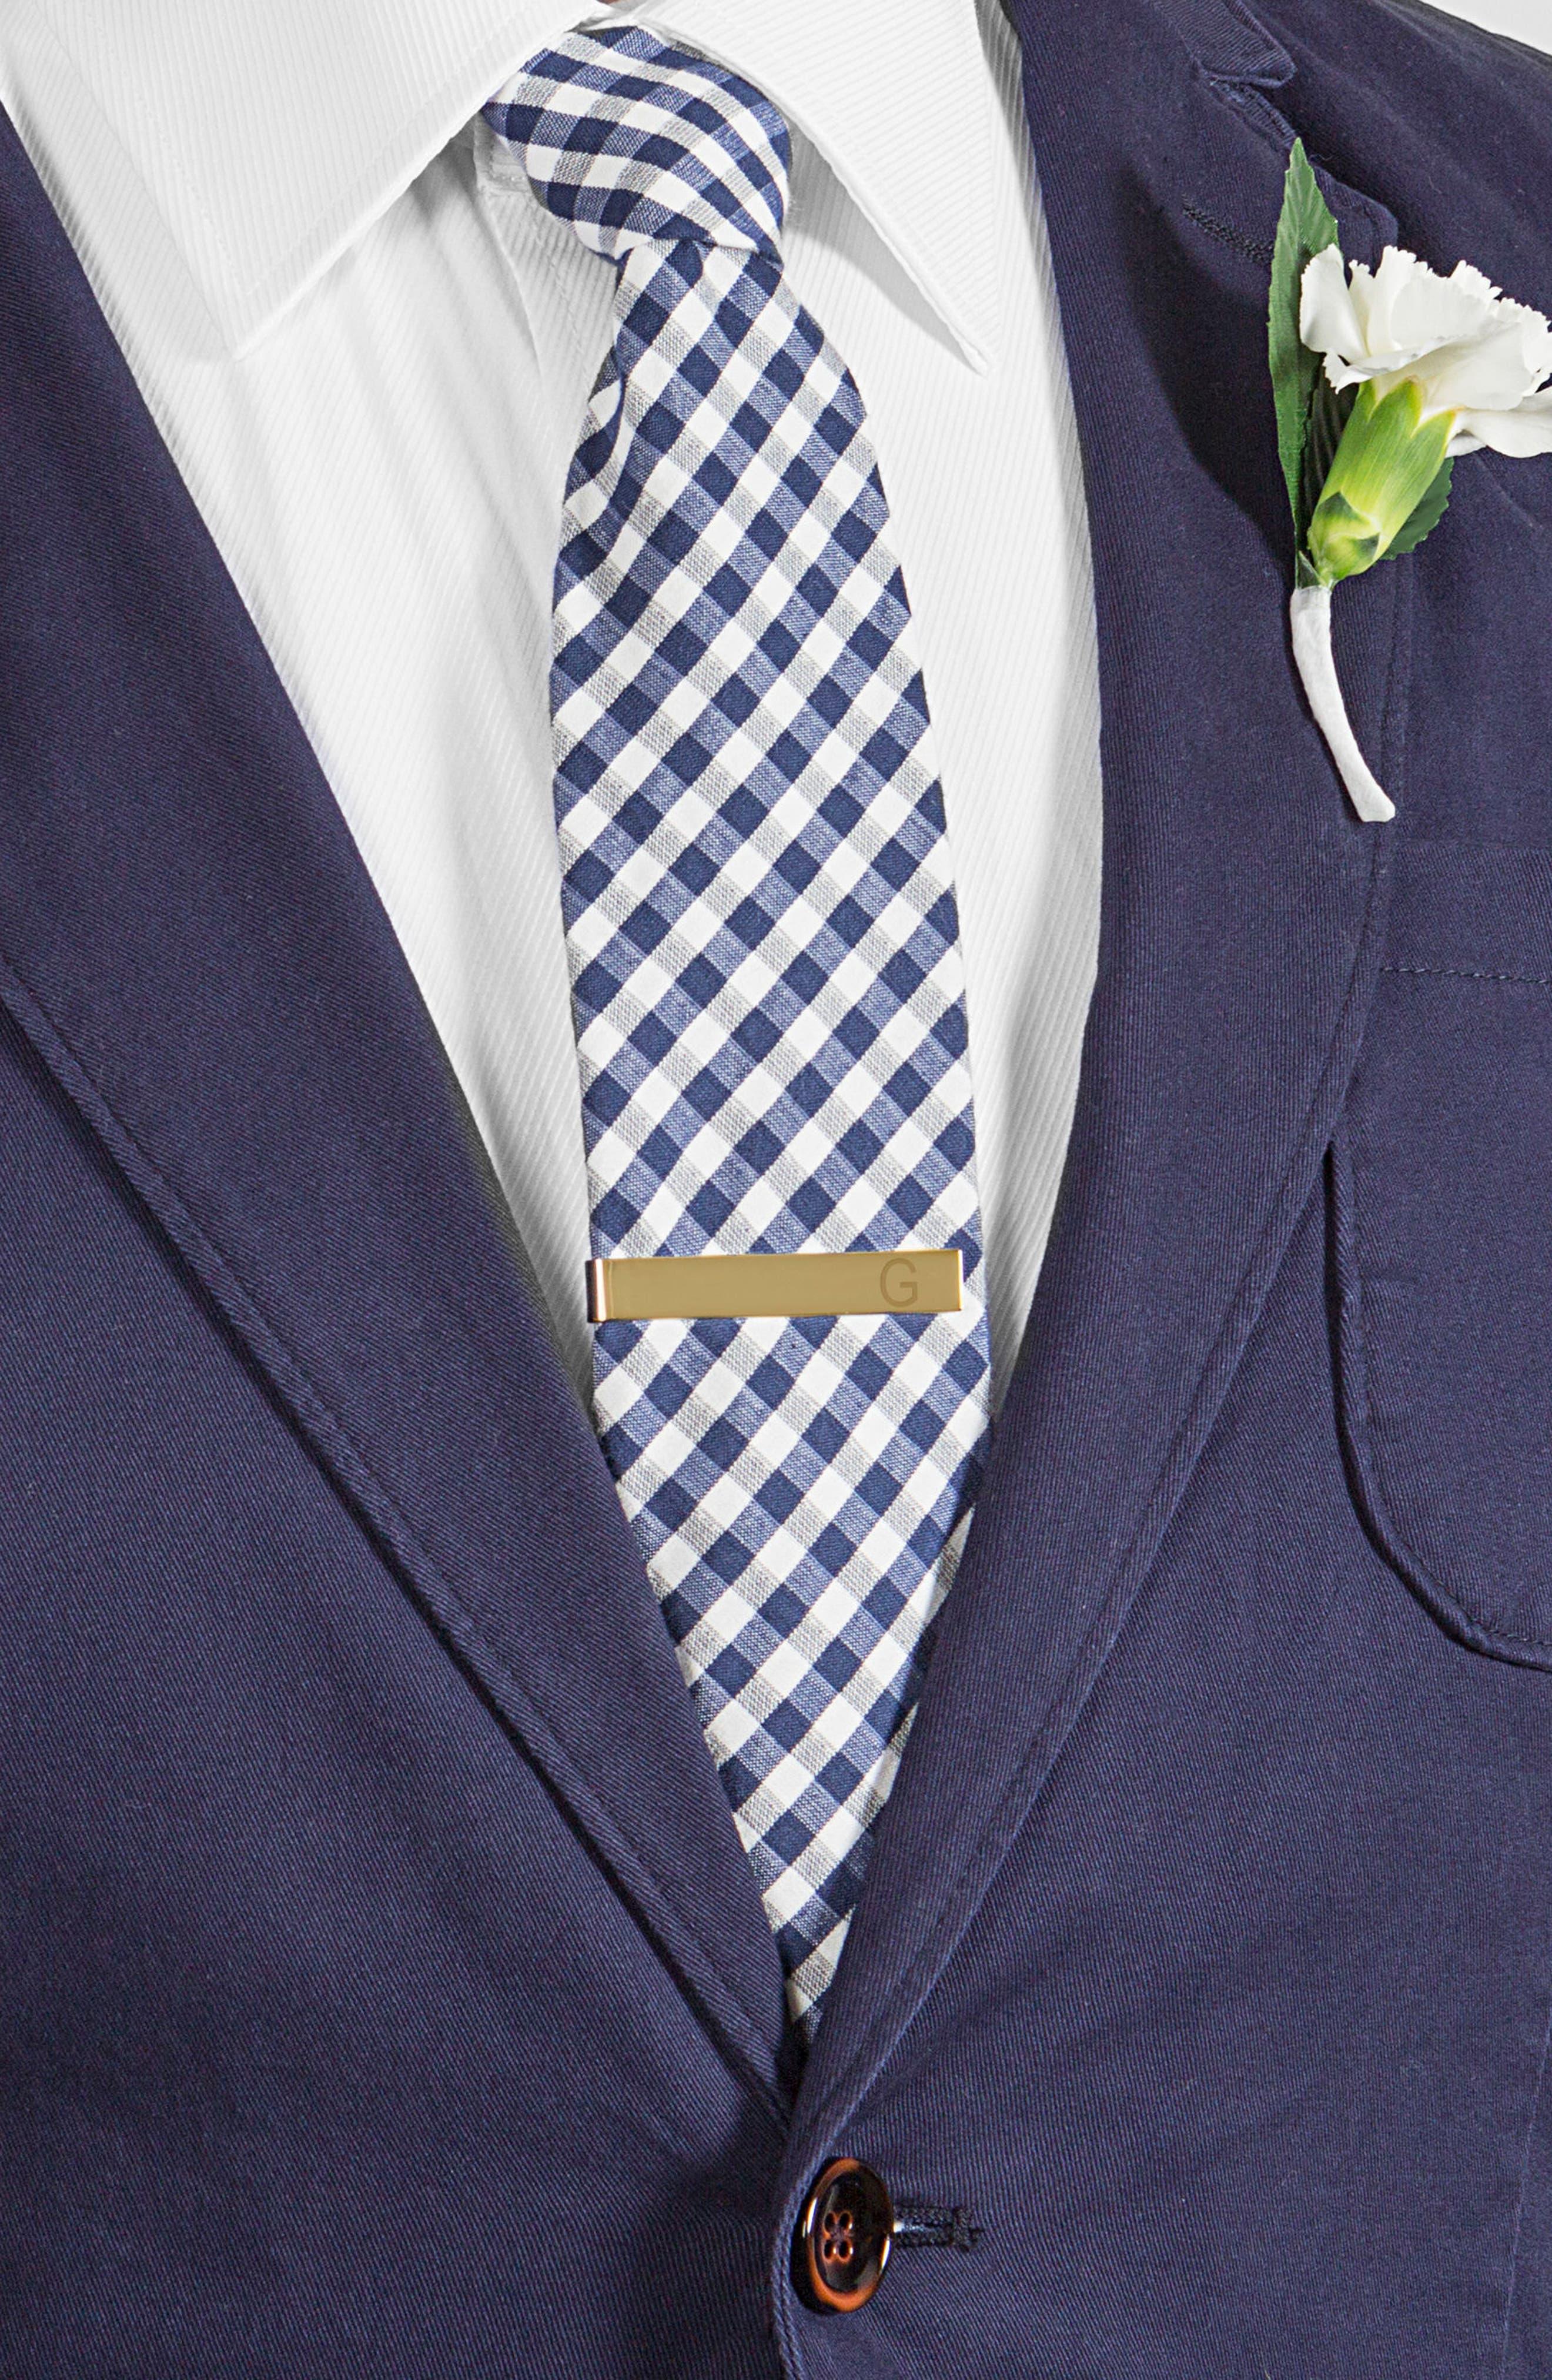 Monogram Cuff Links & Tie Bar Set,                             Alternate thumbnail 2, color,